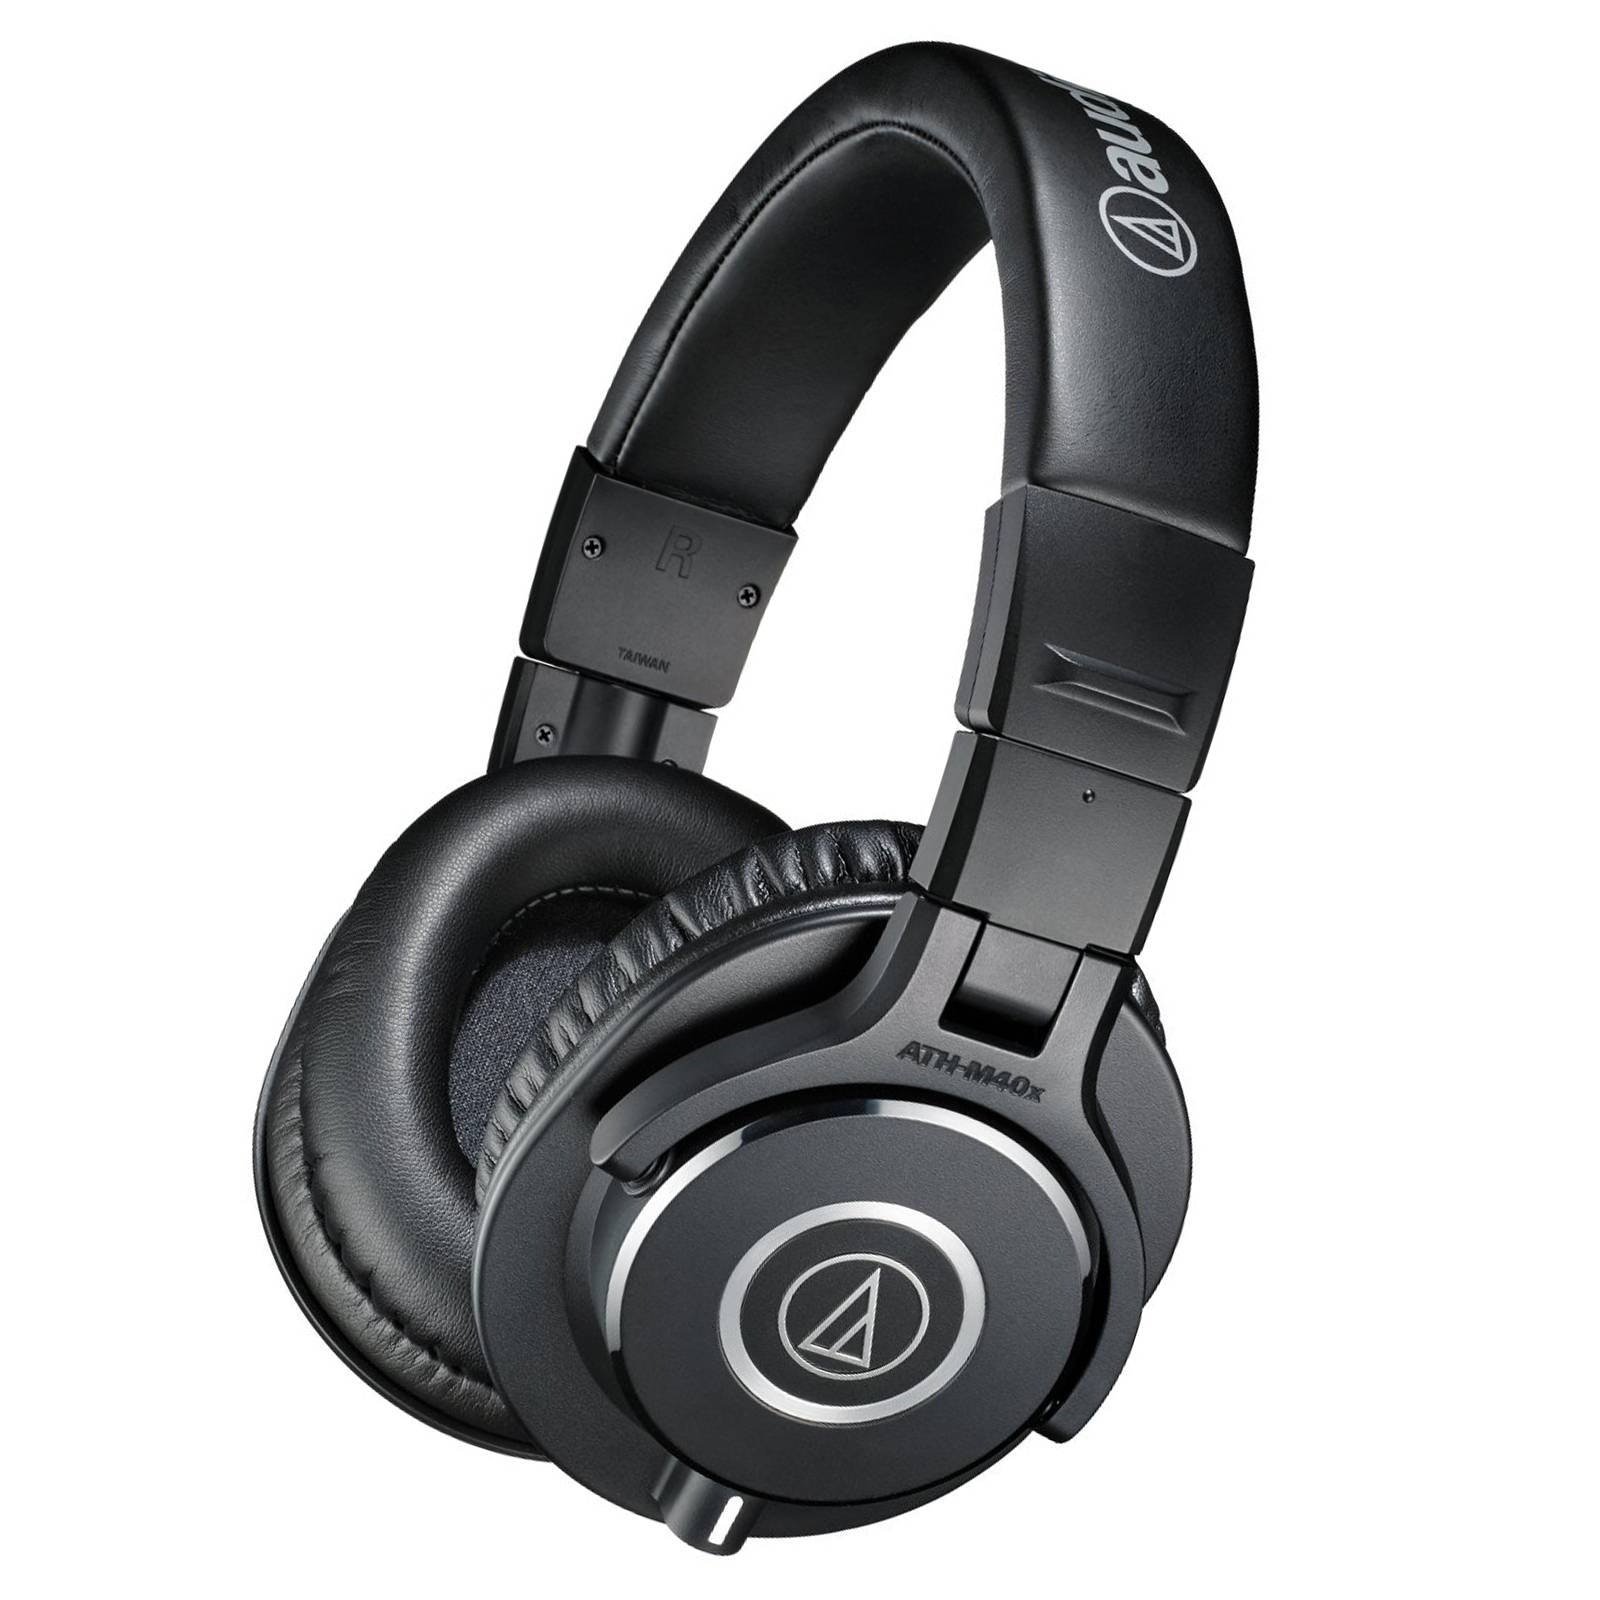 Audio-Technica ATH-M40X Professional Headphones - Black: Amazon.co.uk: Musical I